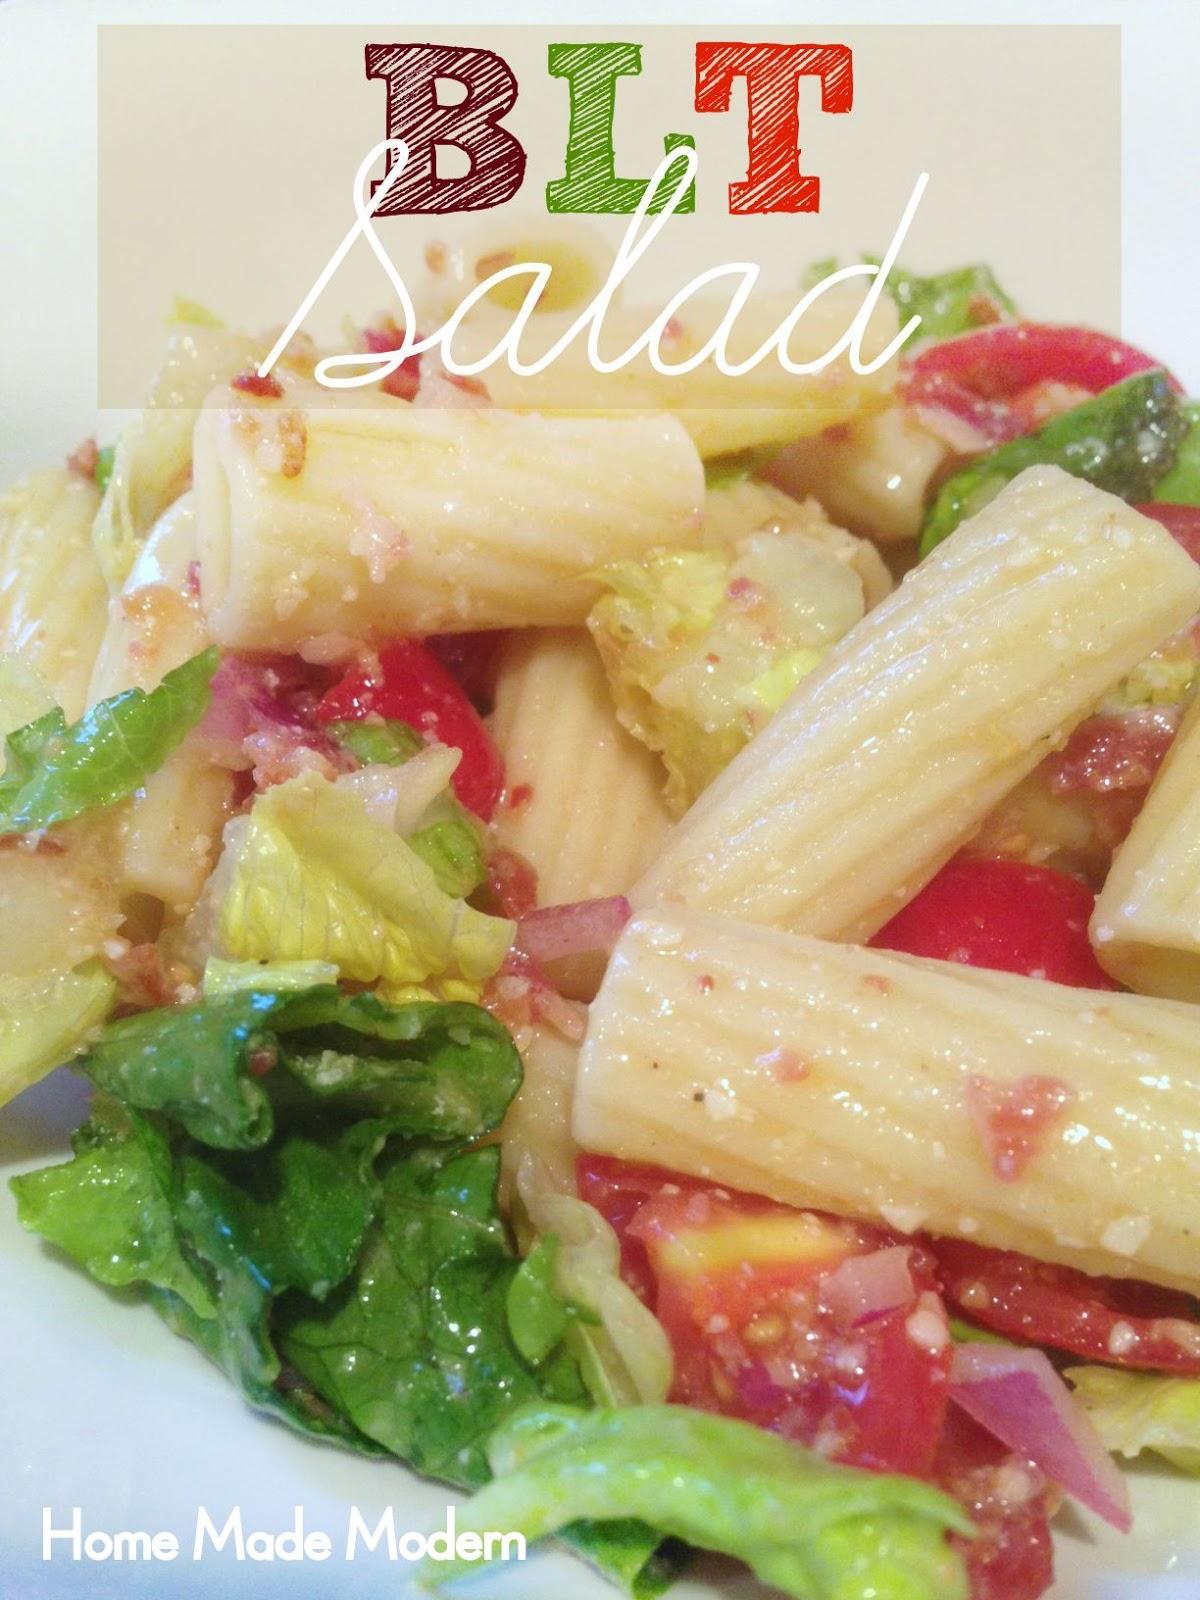 Home Made Modern: BLT Salad